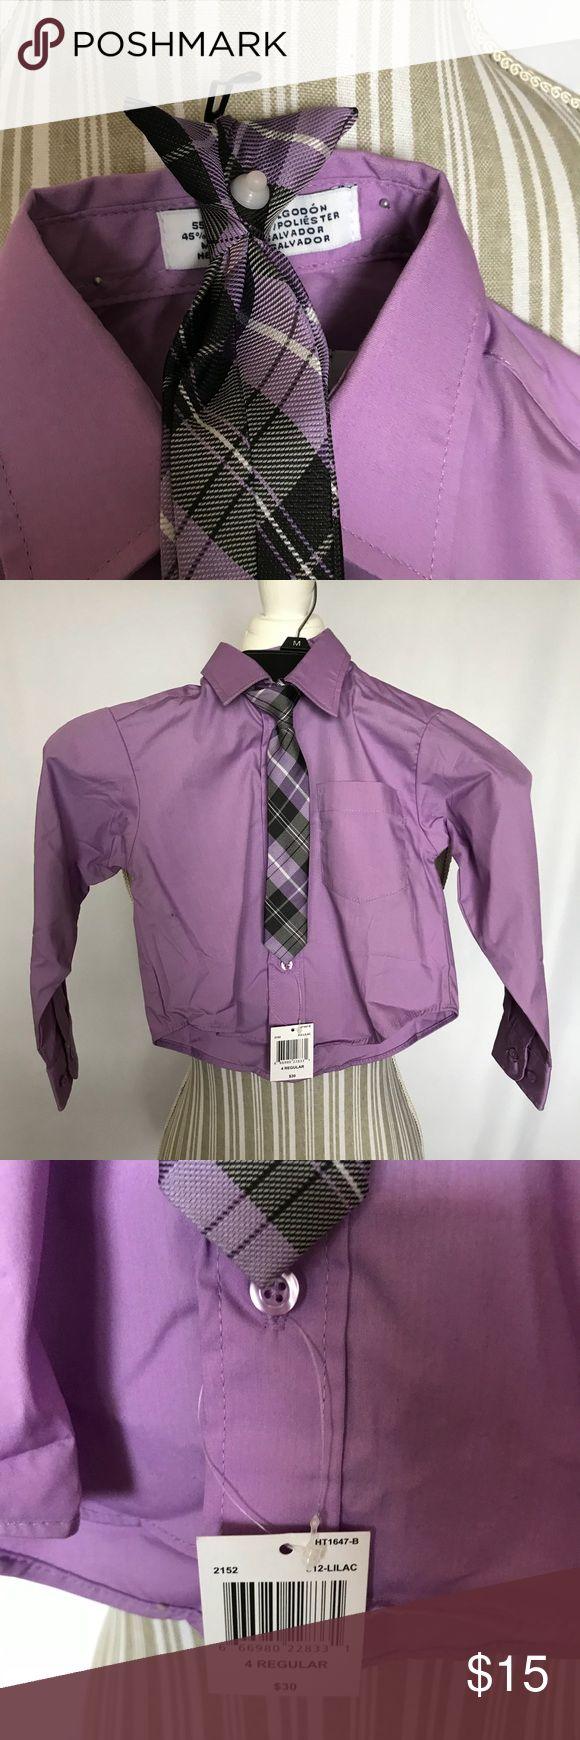 Izod long sleeve dress shirt w/ clip on tie NWT purple long sleeve dress shirt with clip on tie. 55% cotton 45% polyester Izod Shirts & Tops Tees - Long Sleeve